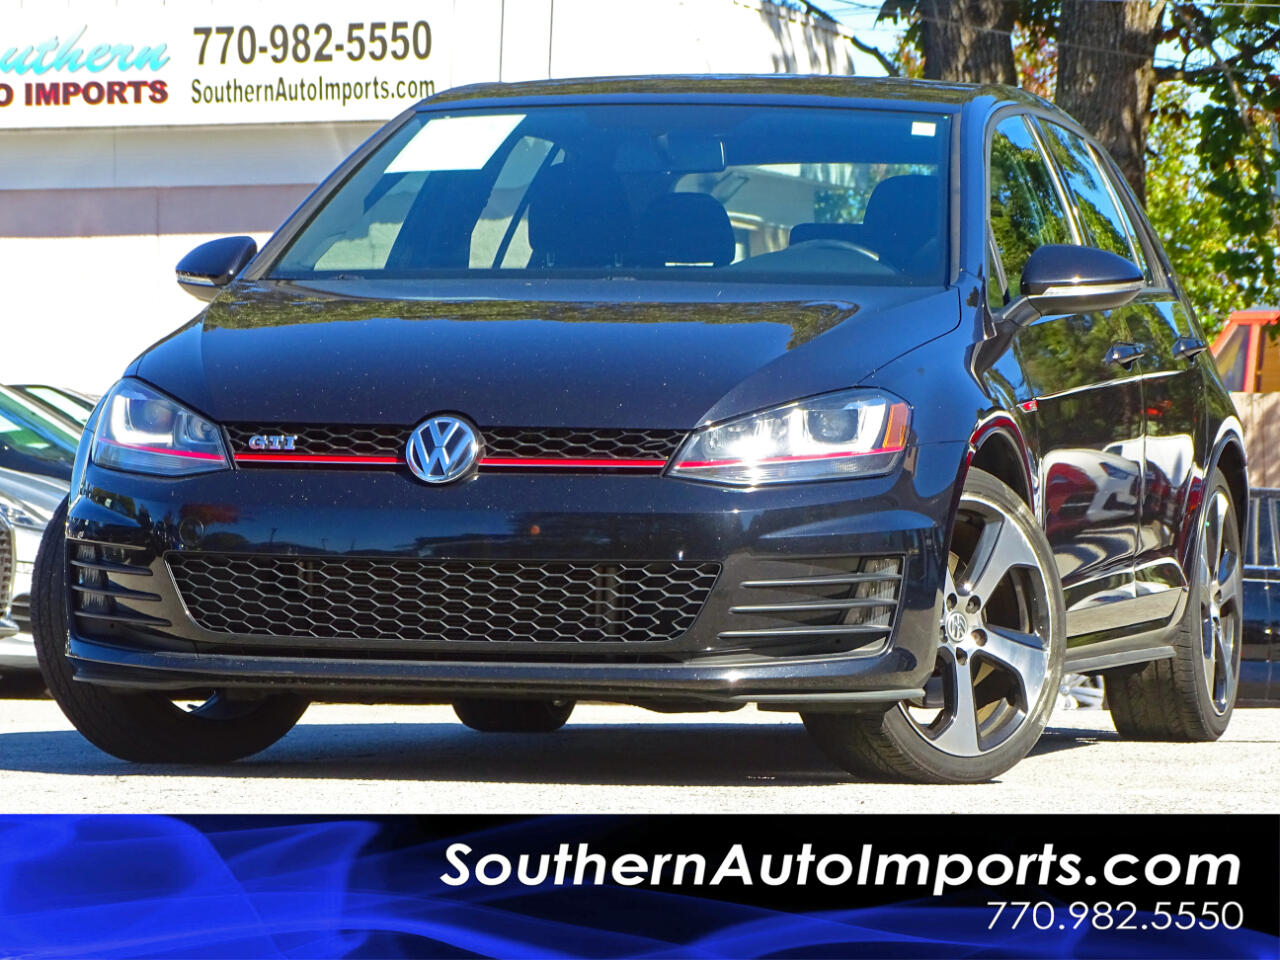 2015 Volkswagen Golf GTI GTI S Xenon Headlights Back up Camera